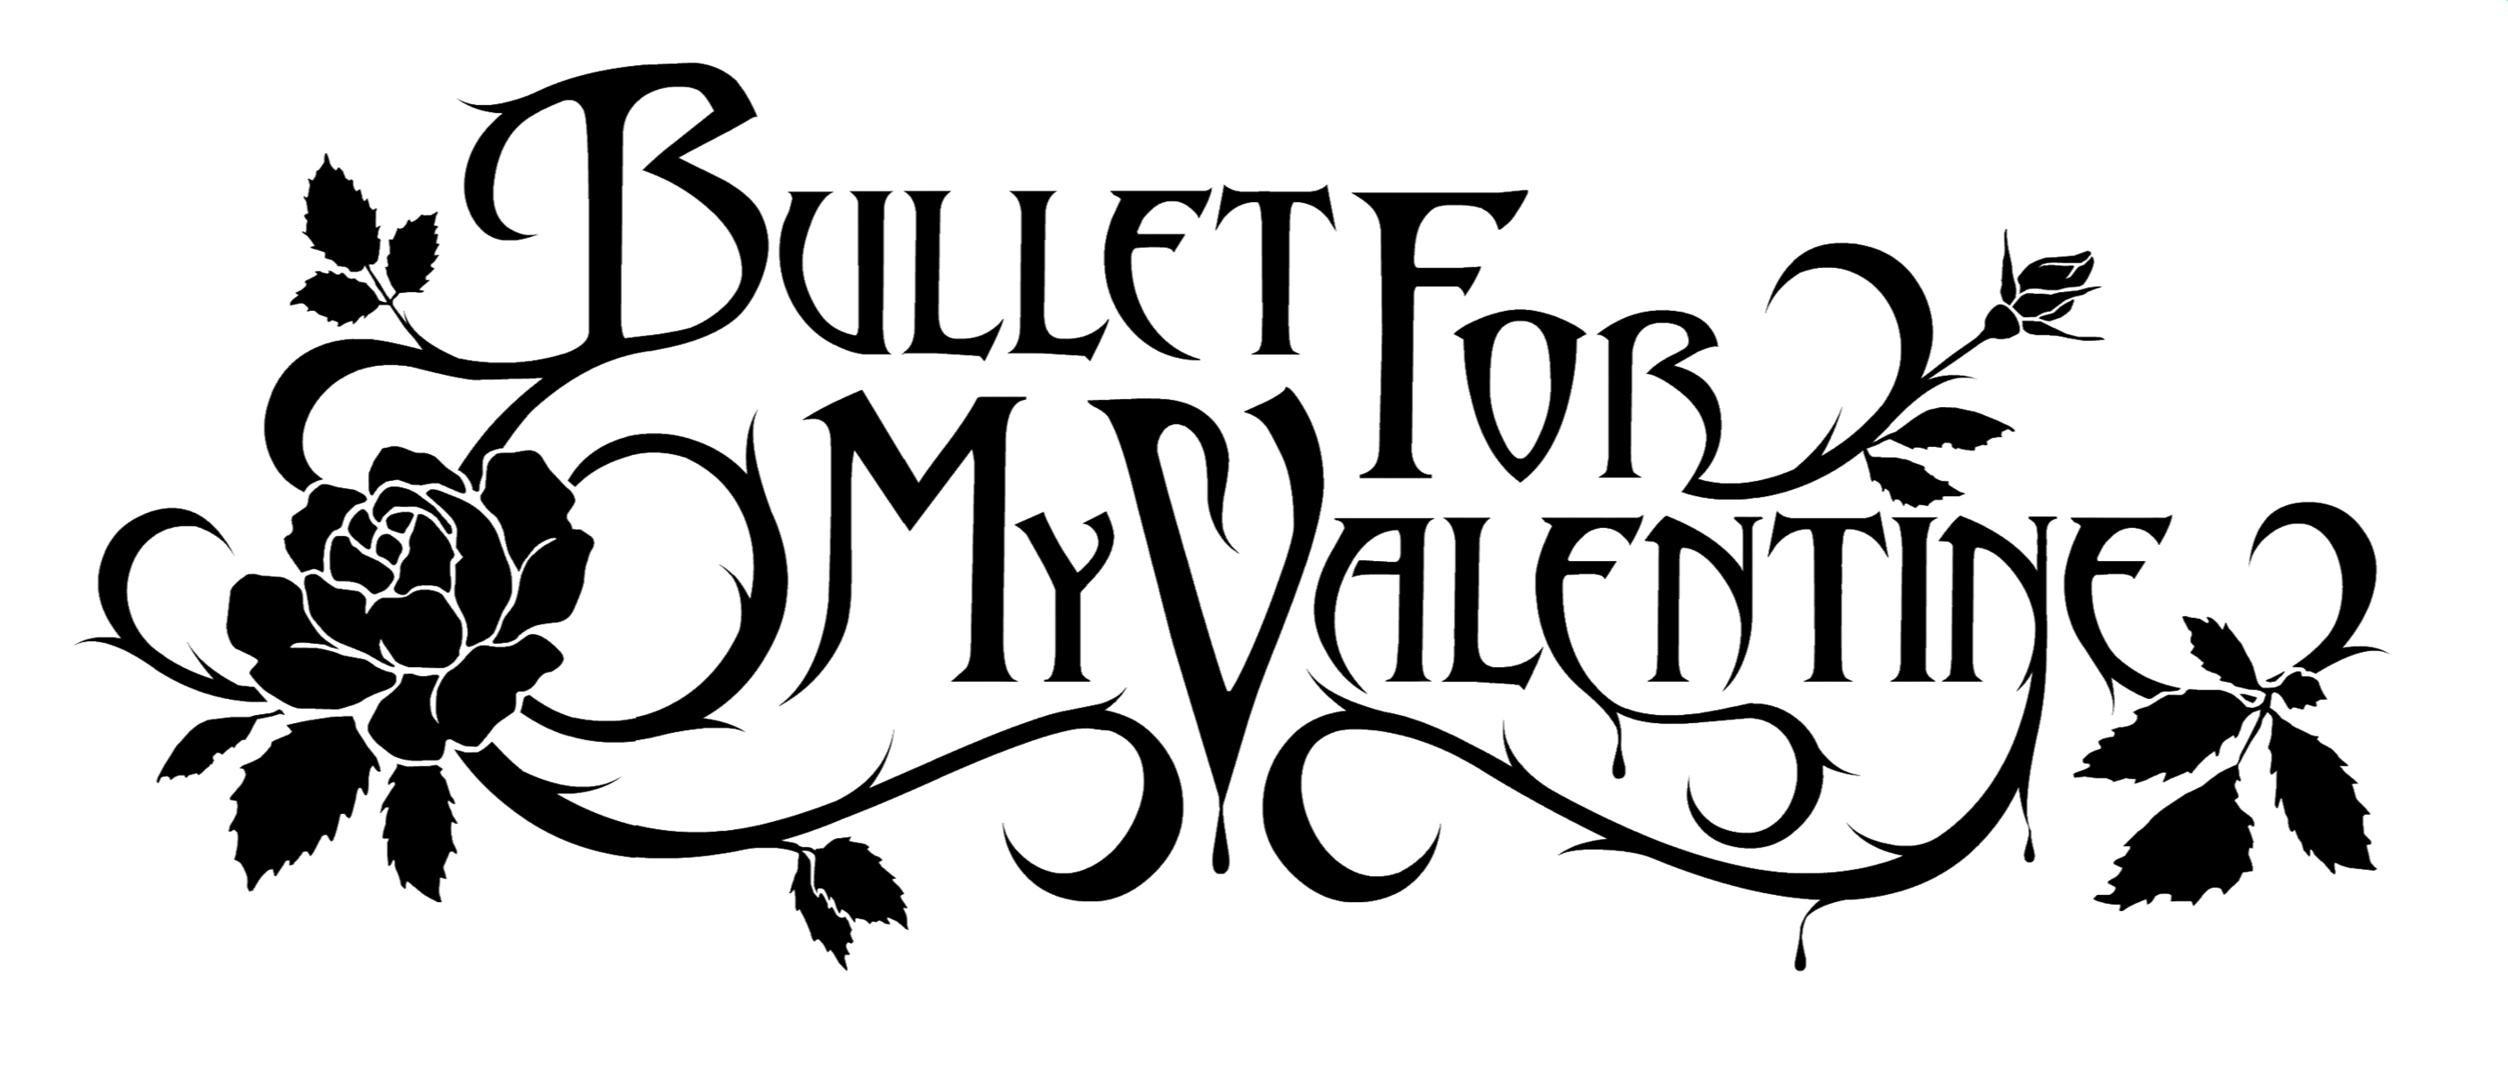 bullet for my valentine heavy metal metalcore 41